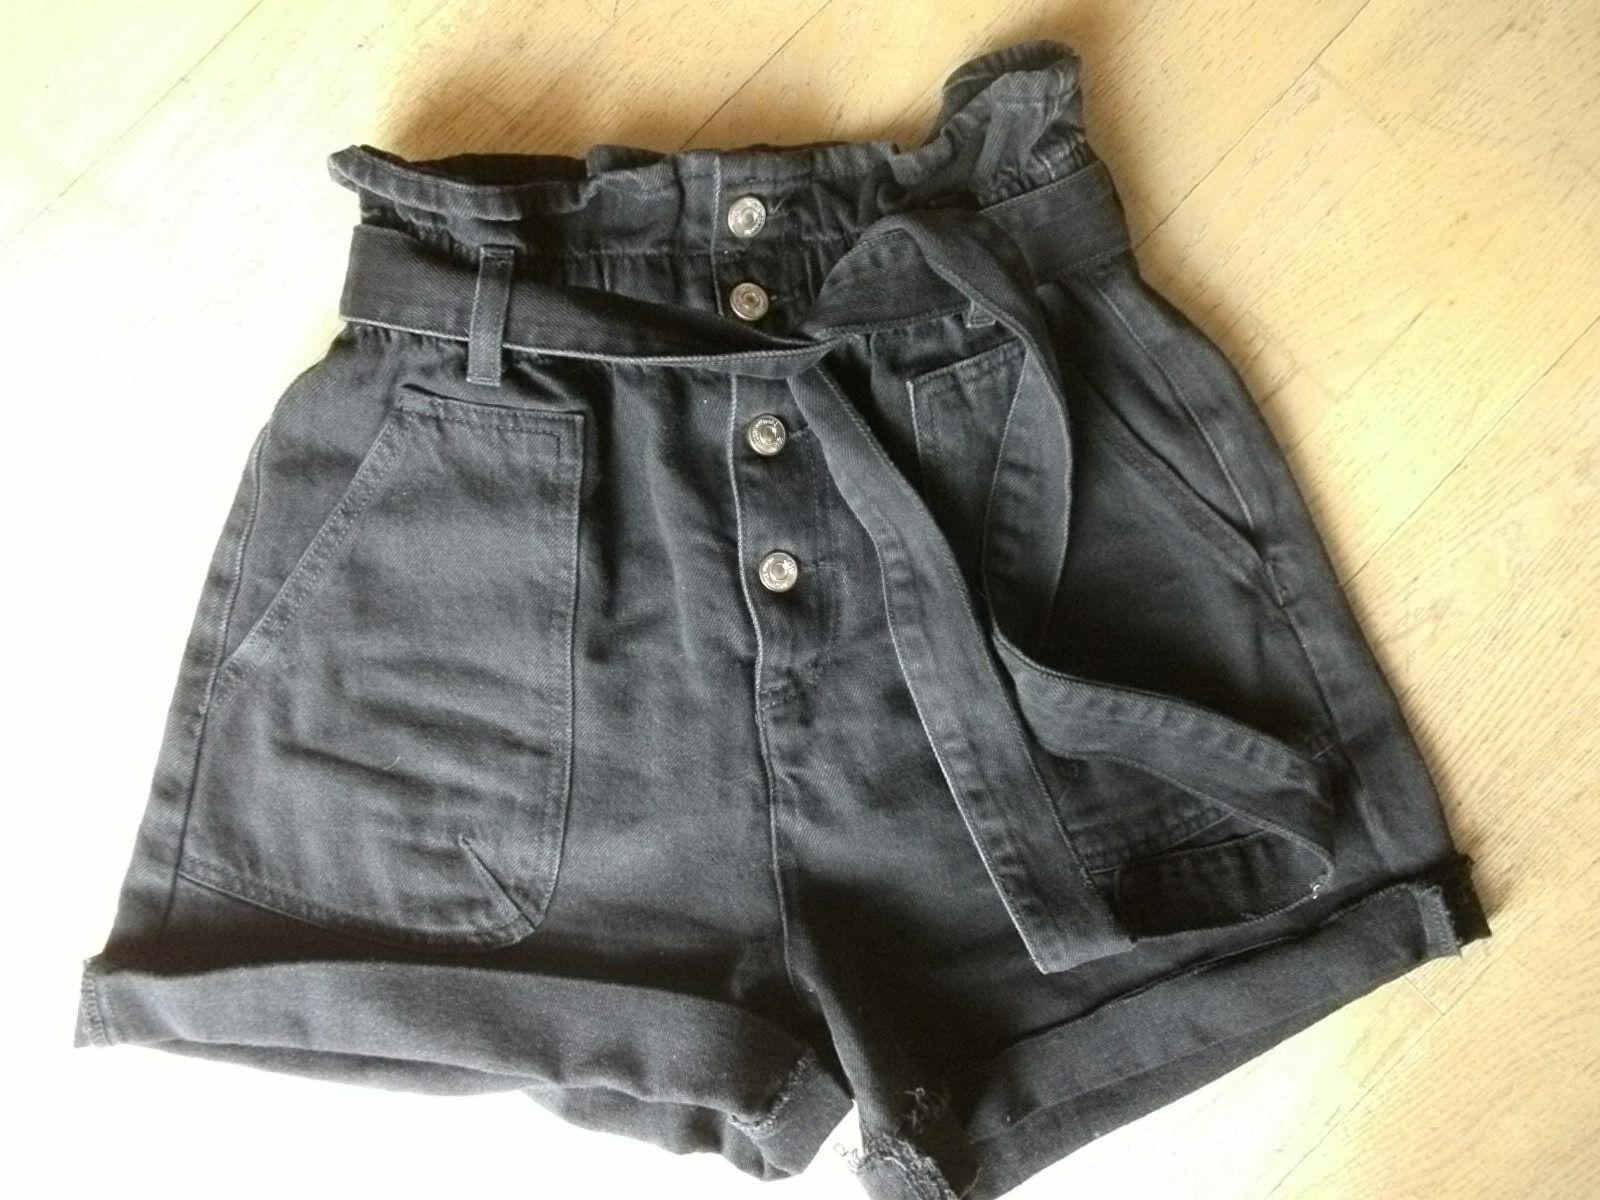 Zara Jeans Shorts Mom Jeans Loose Fit Denim 28 38 M Hose schwarz Hight Waist